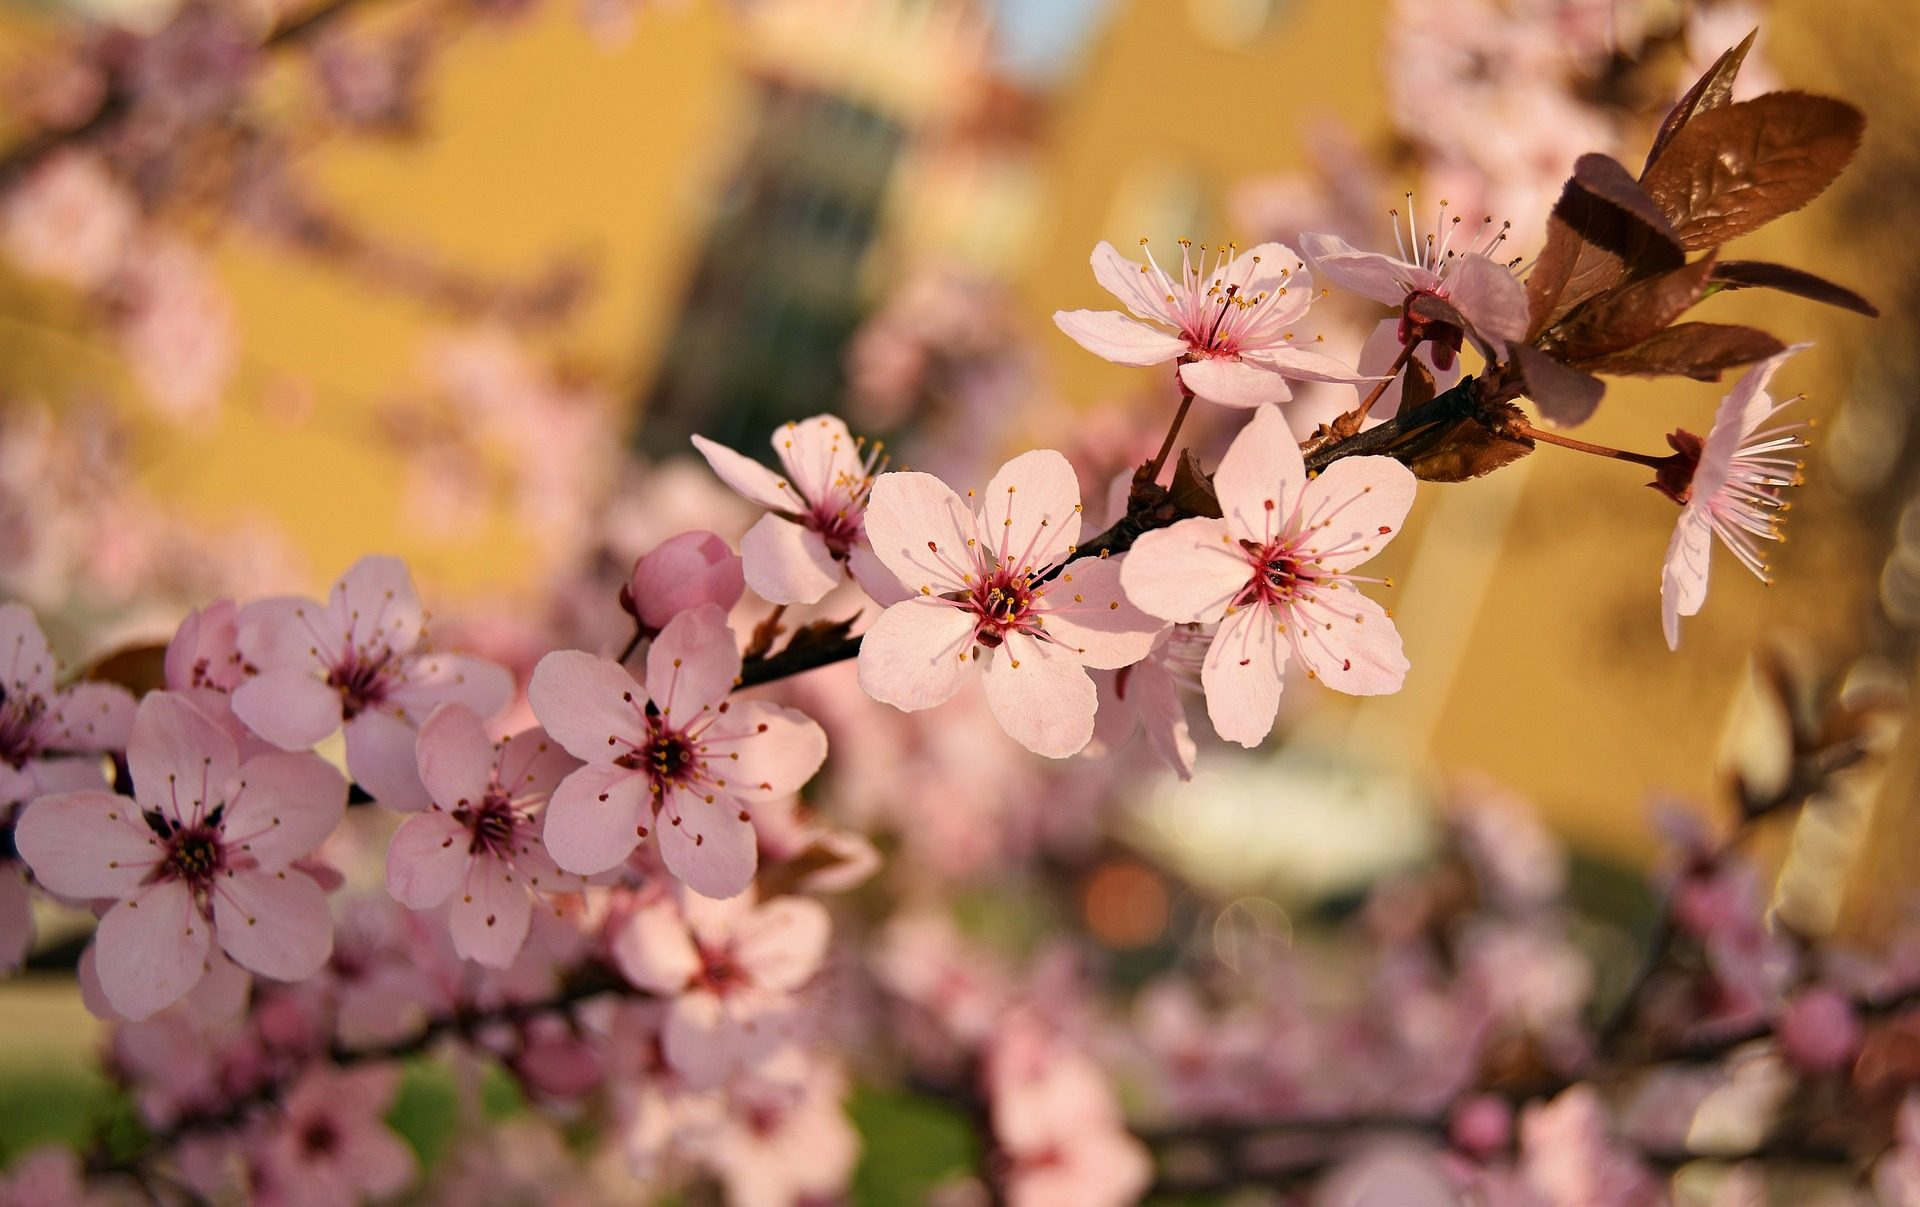 Цветы, лепестки, филиал, дерево, Весна - Обои HD - Профессор falken.com